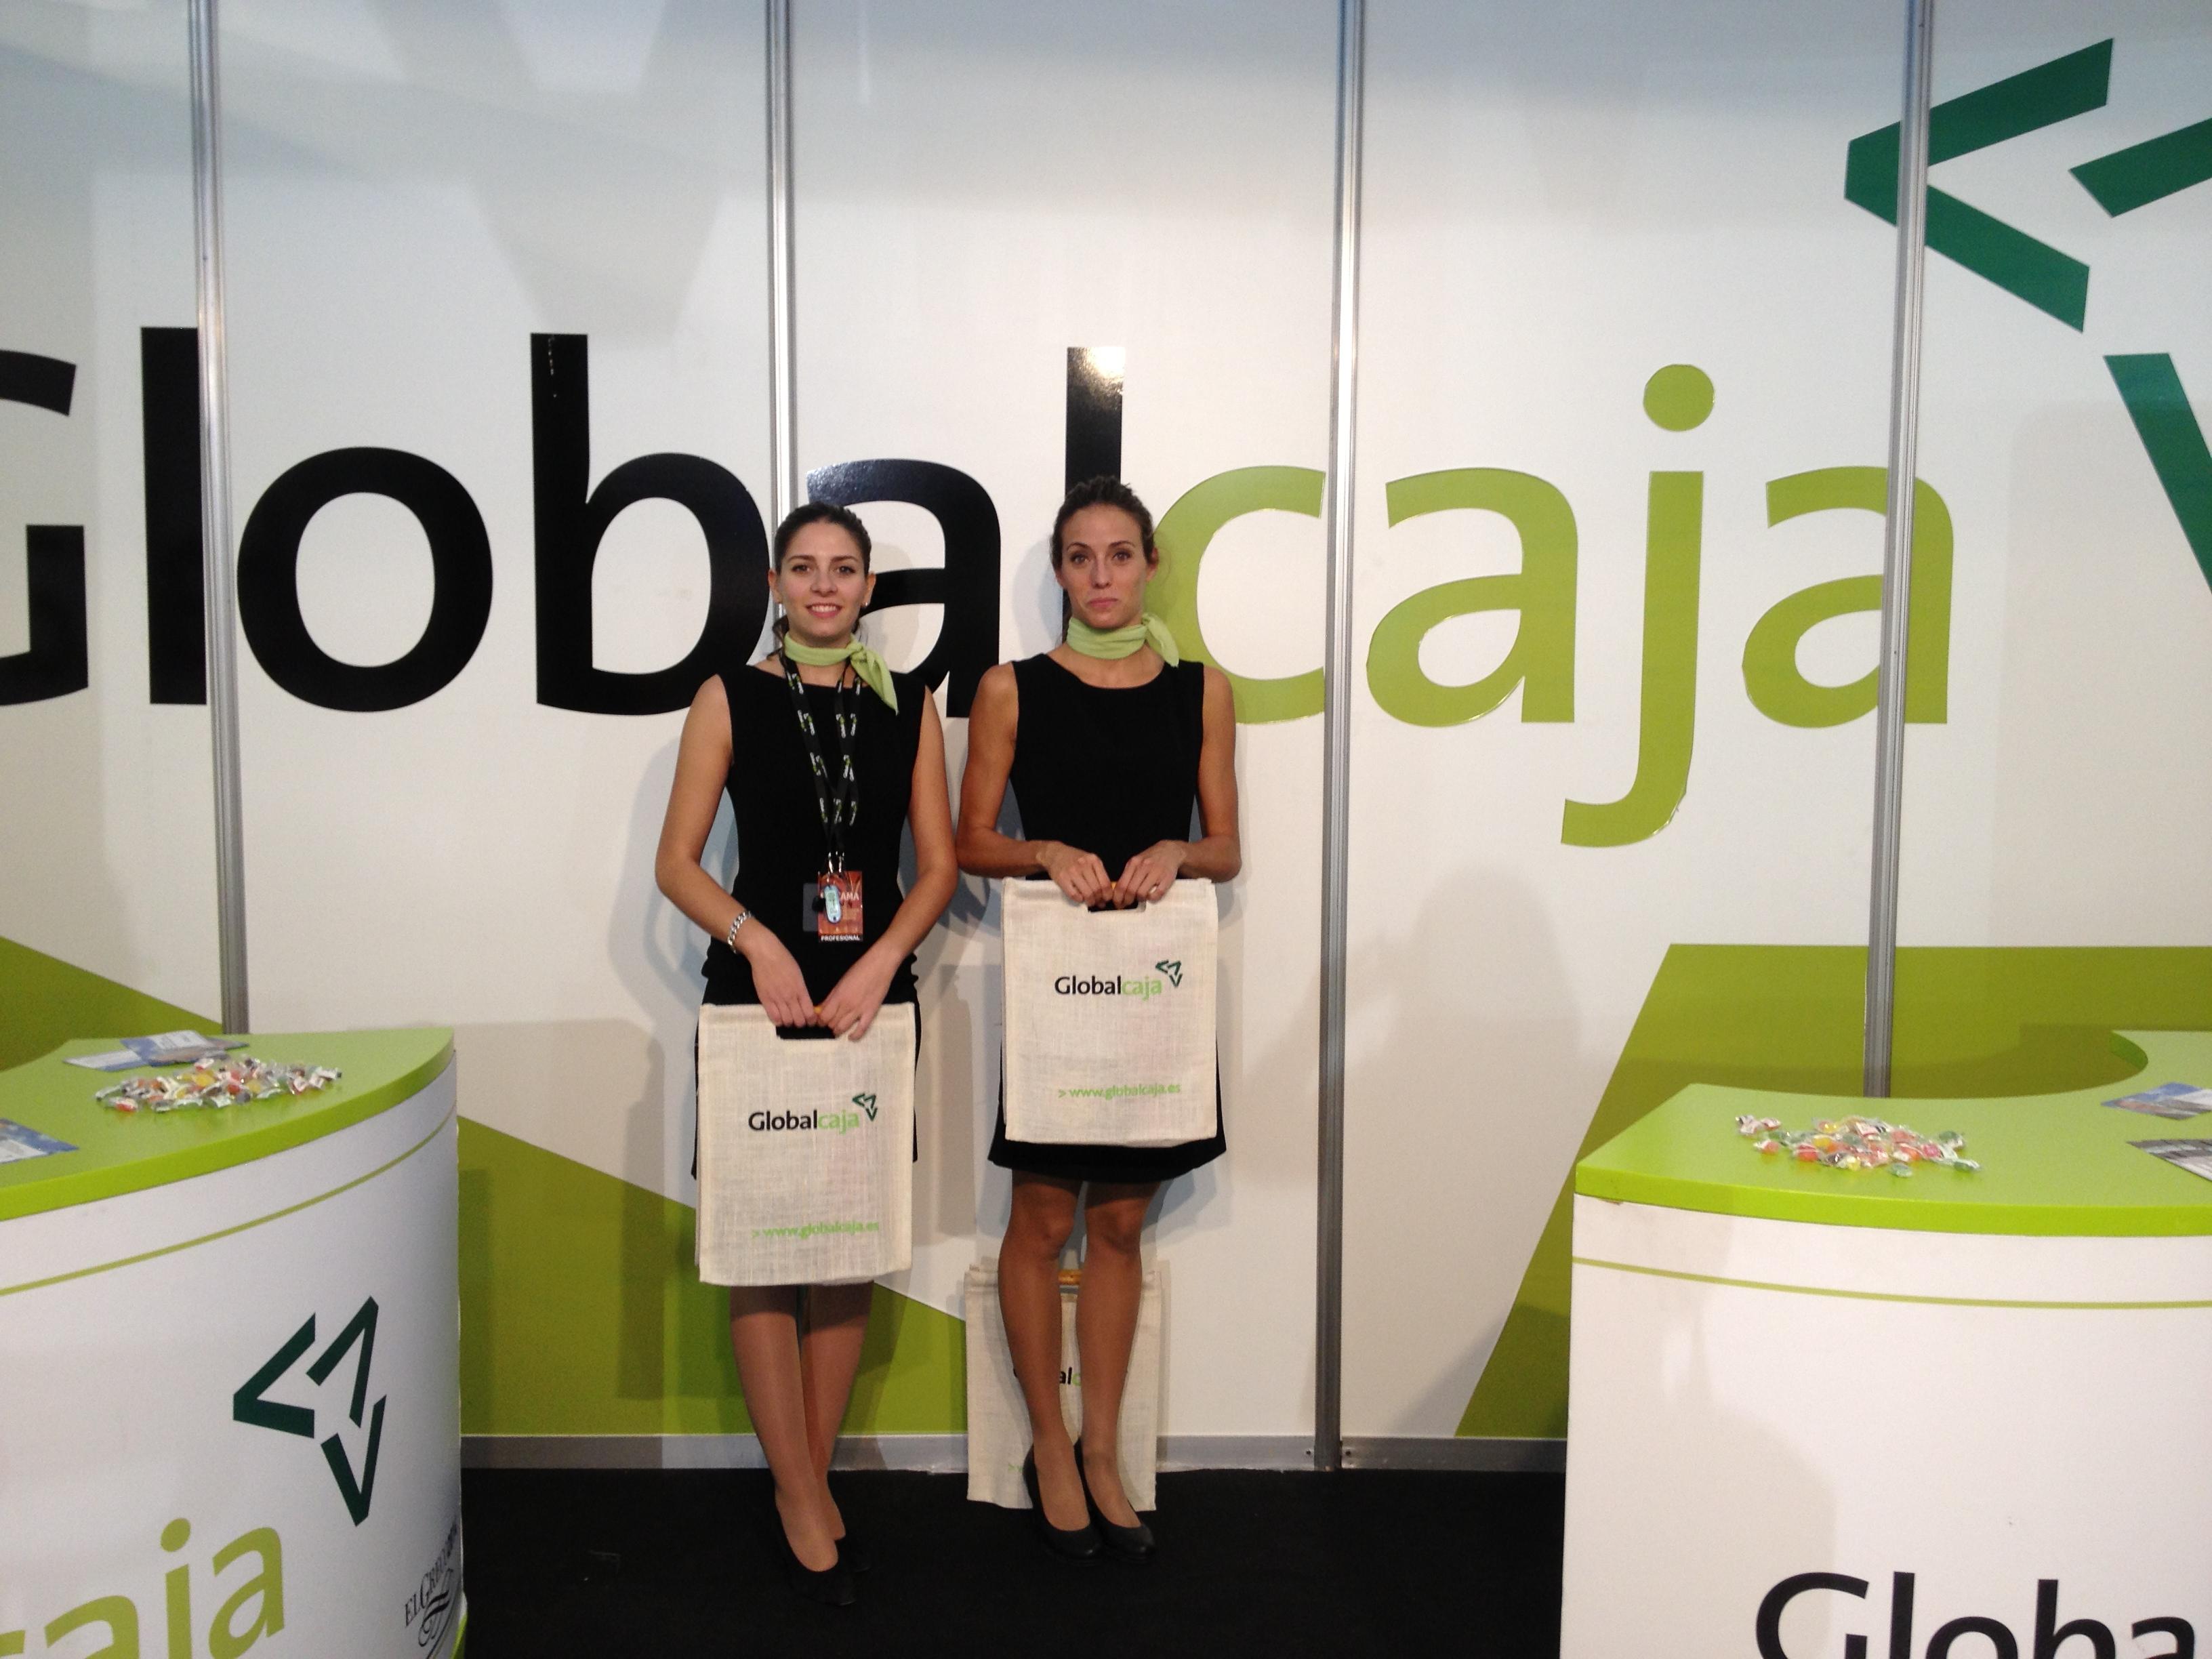 Recepción de autoridades en evento de GLOBALCAJA